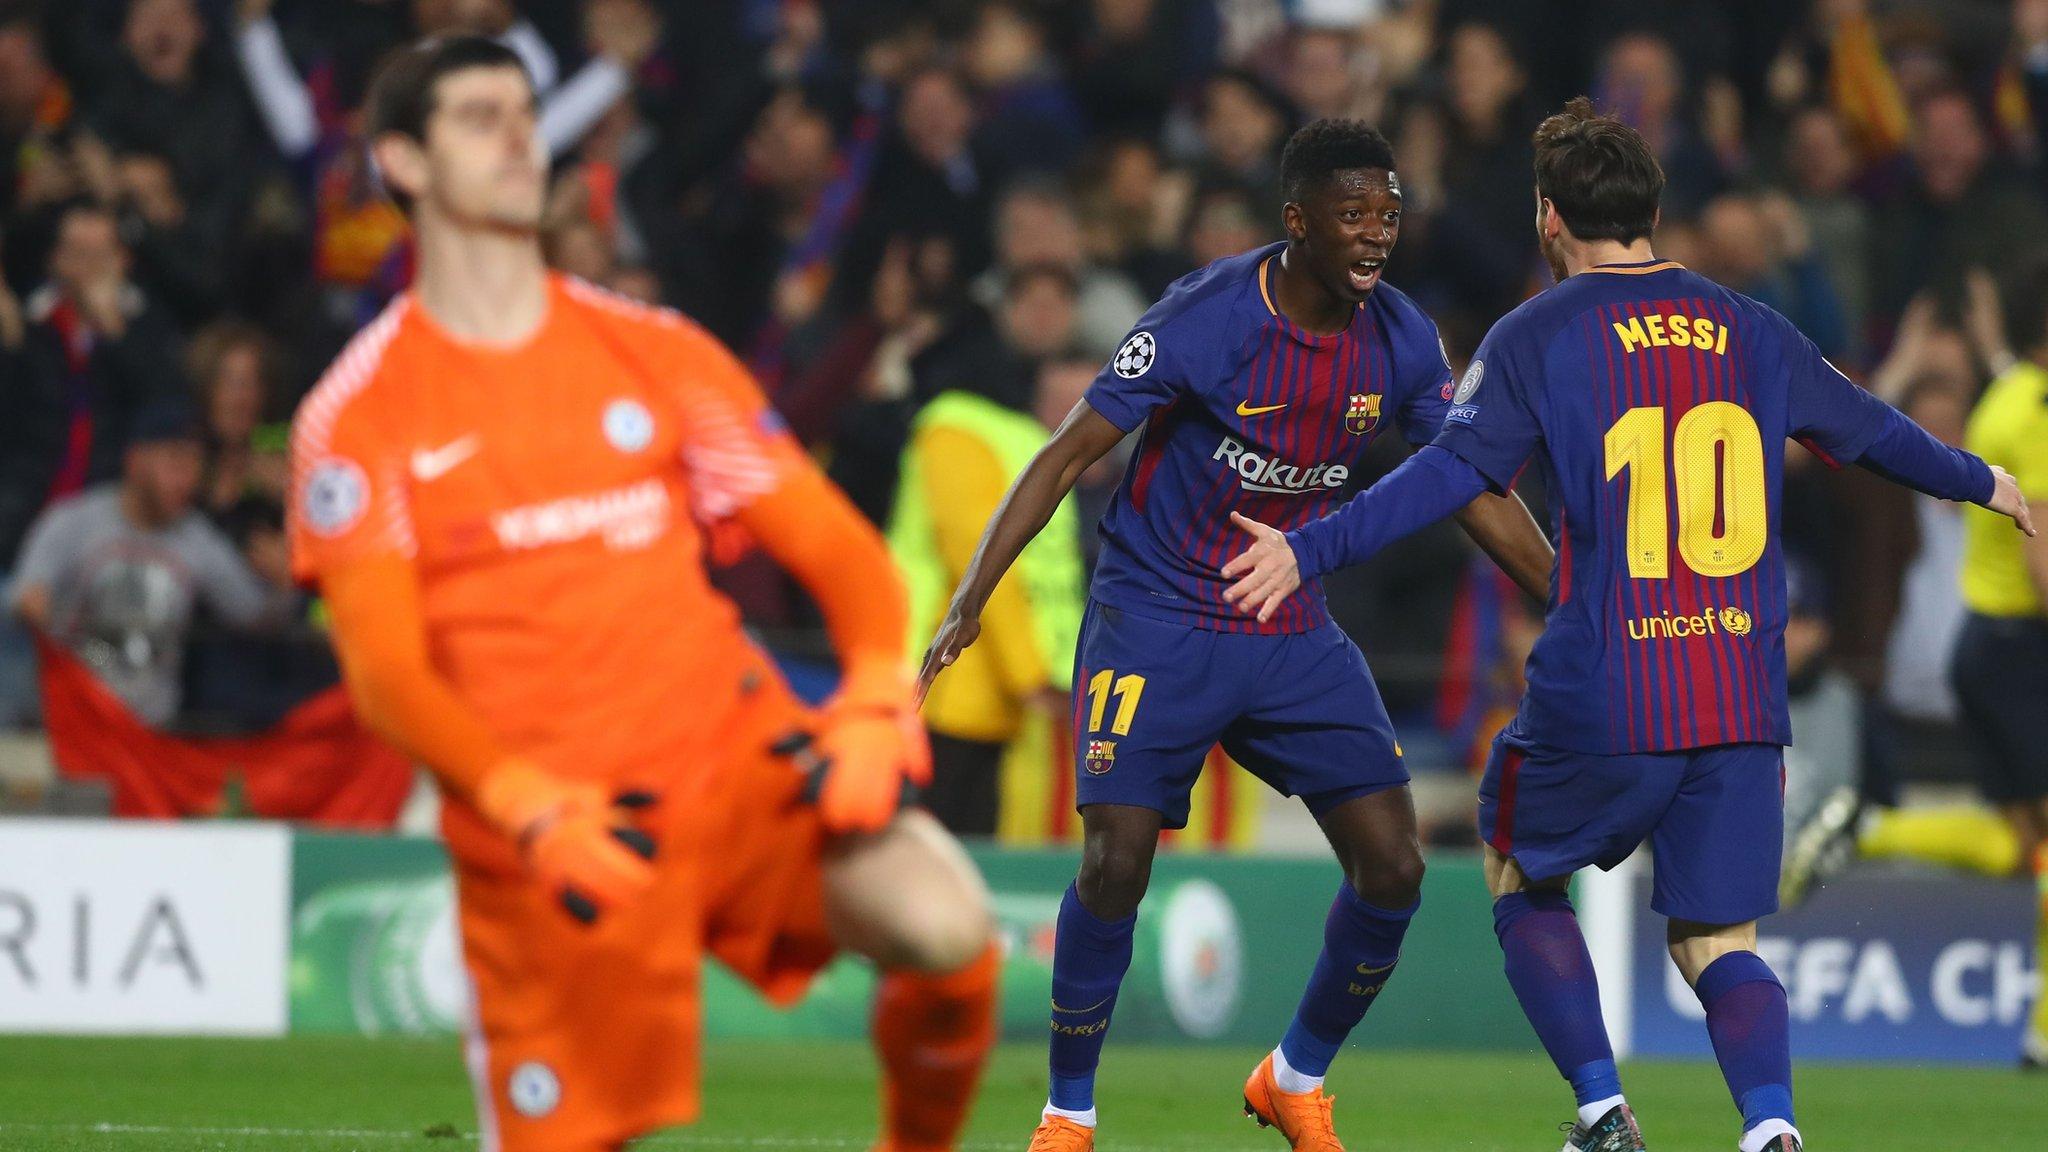 Barcelona 3-0 Chelsea (Agg: 4-1)